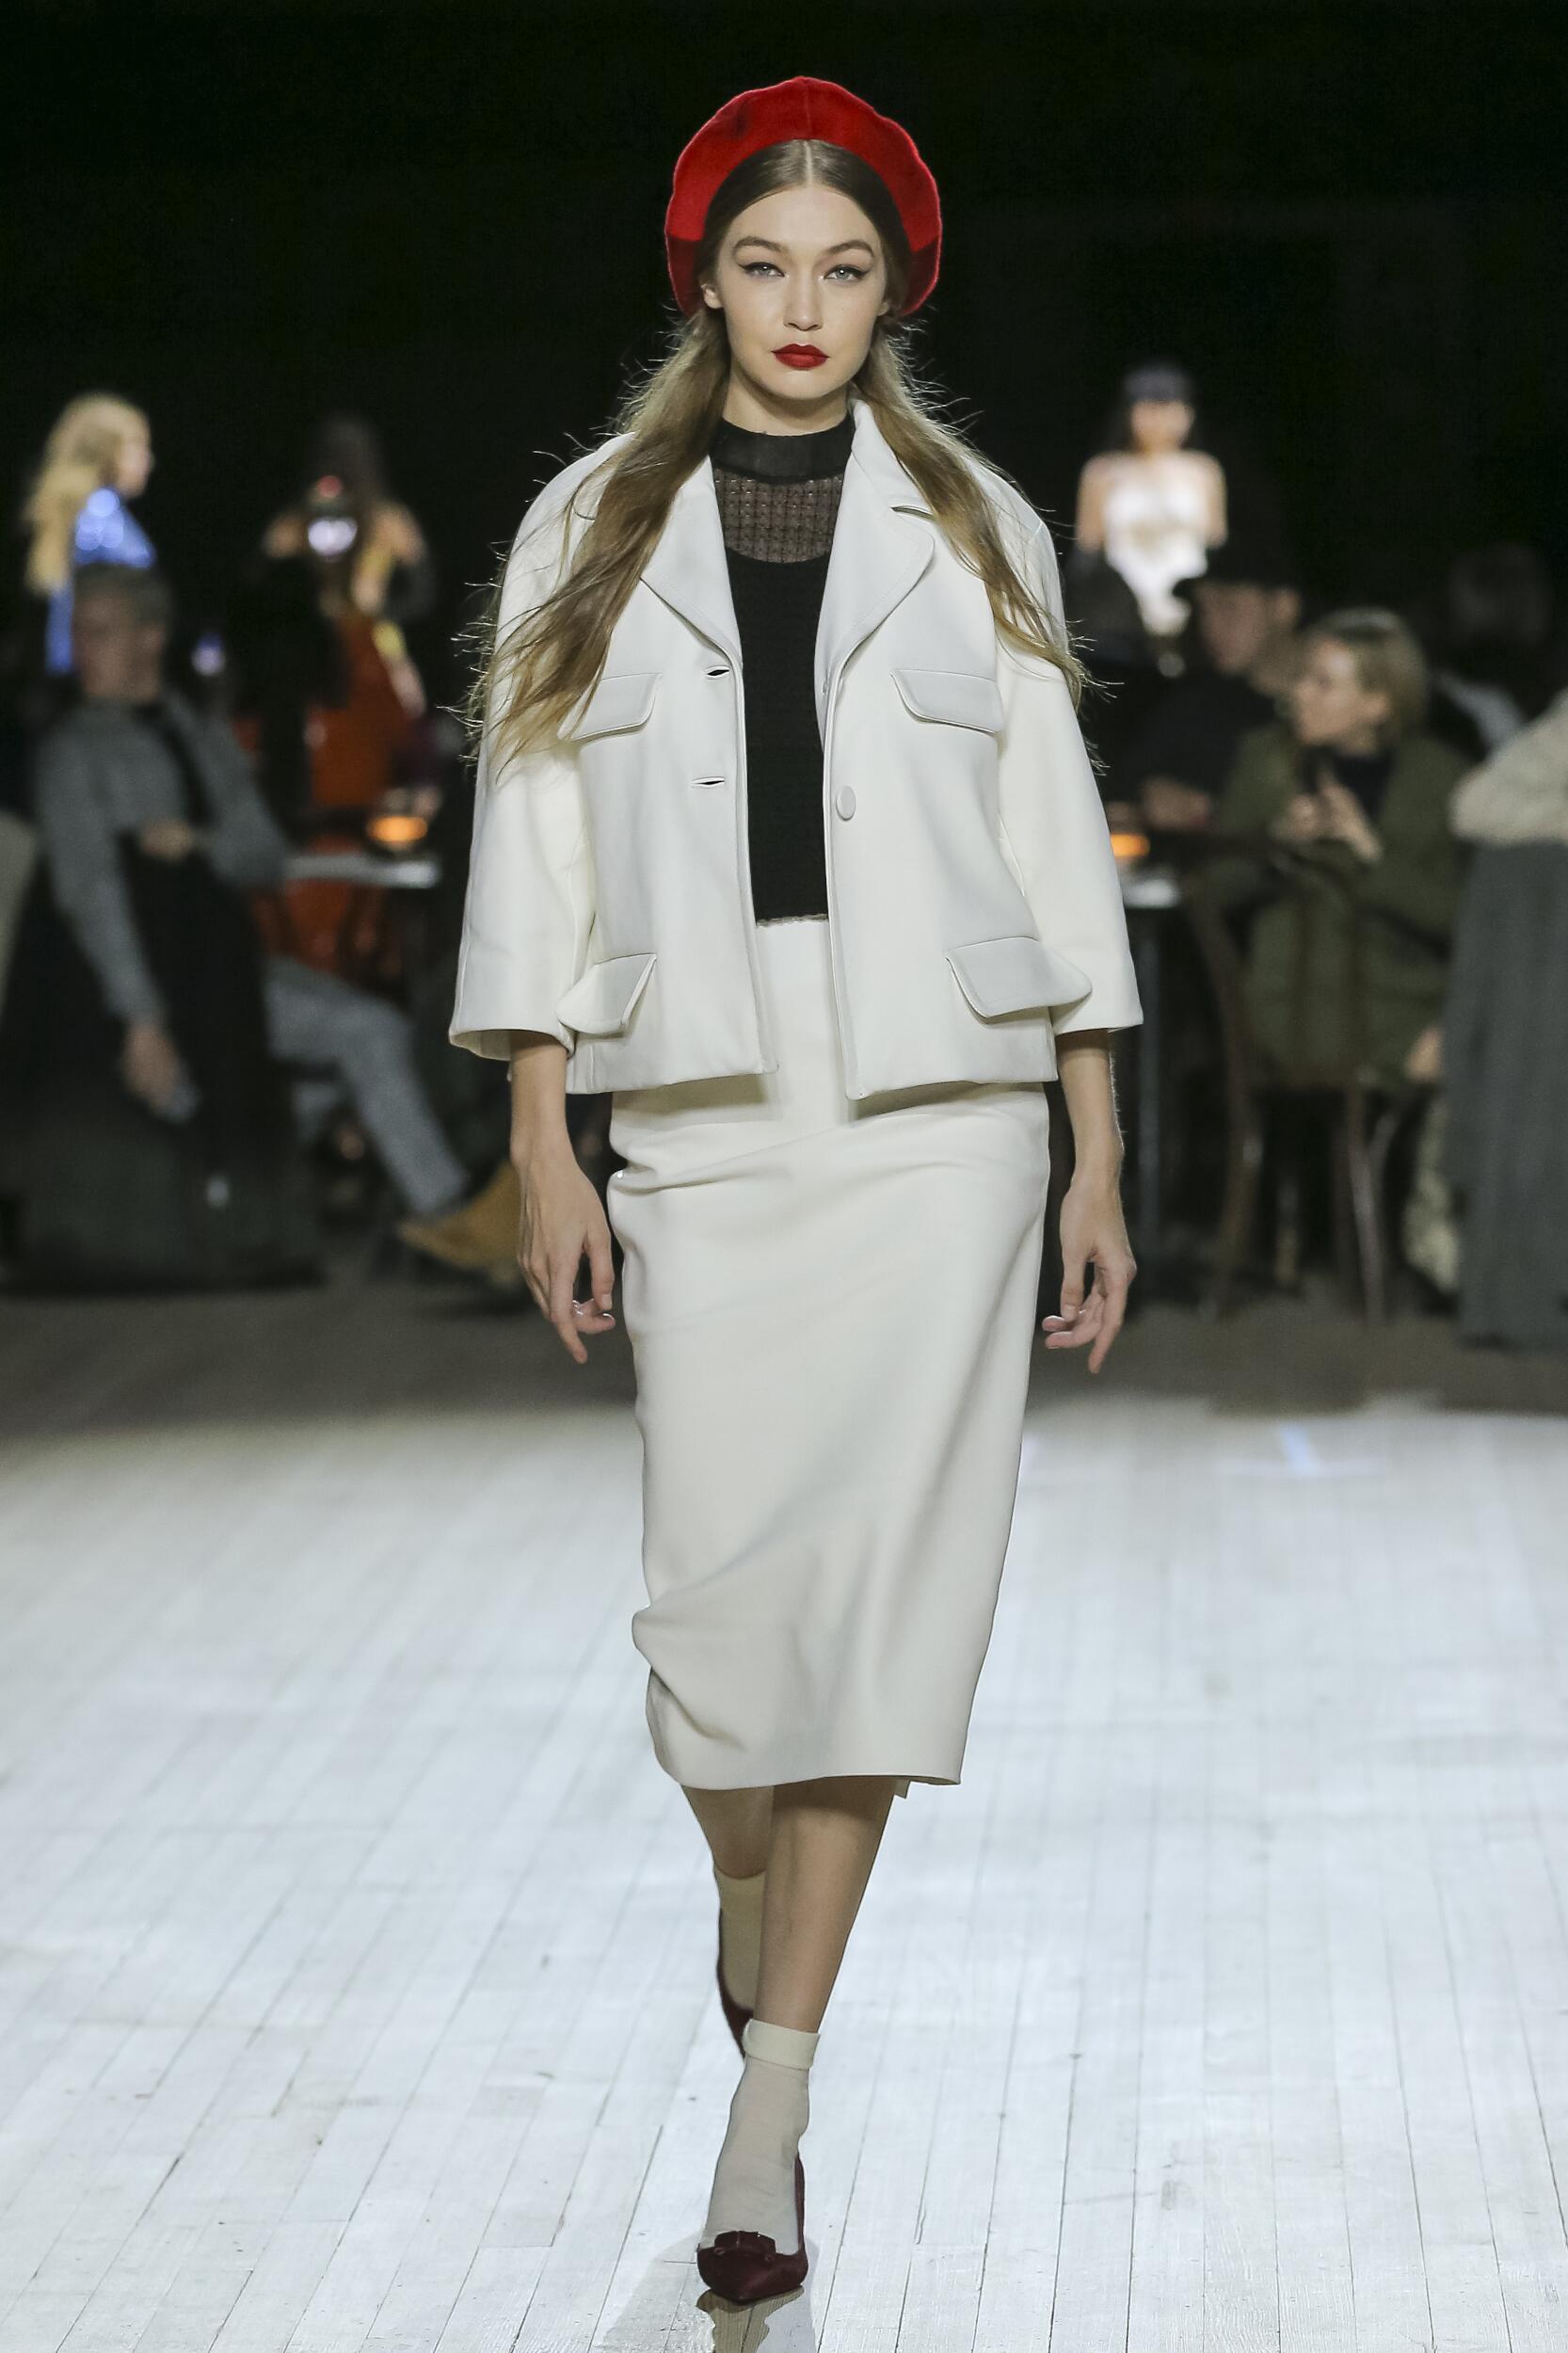 Marc Jacobs Woman 2020-21